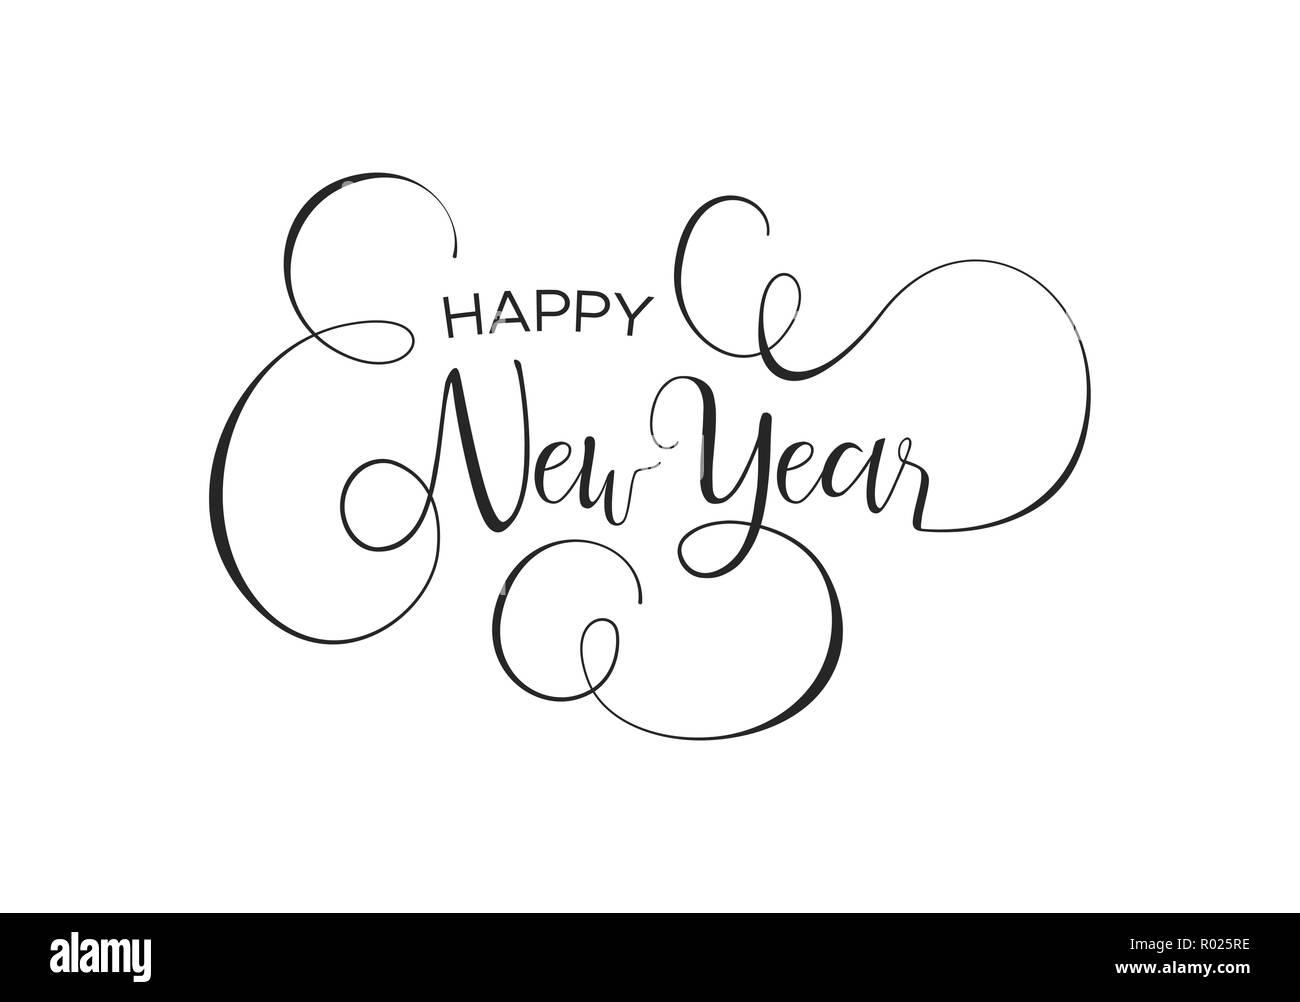 Happy New Year Elegant Images 98